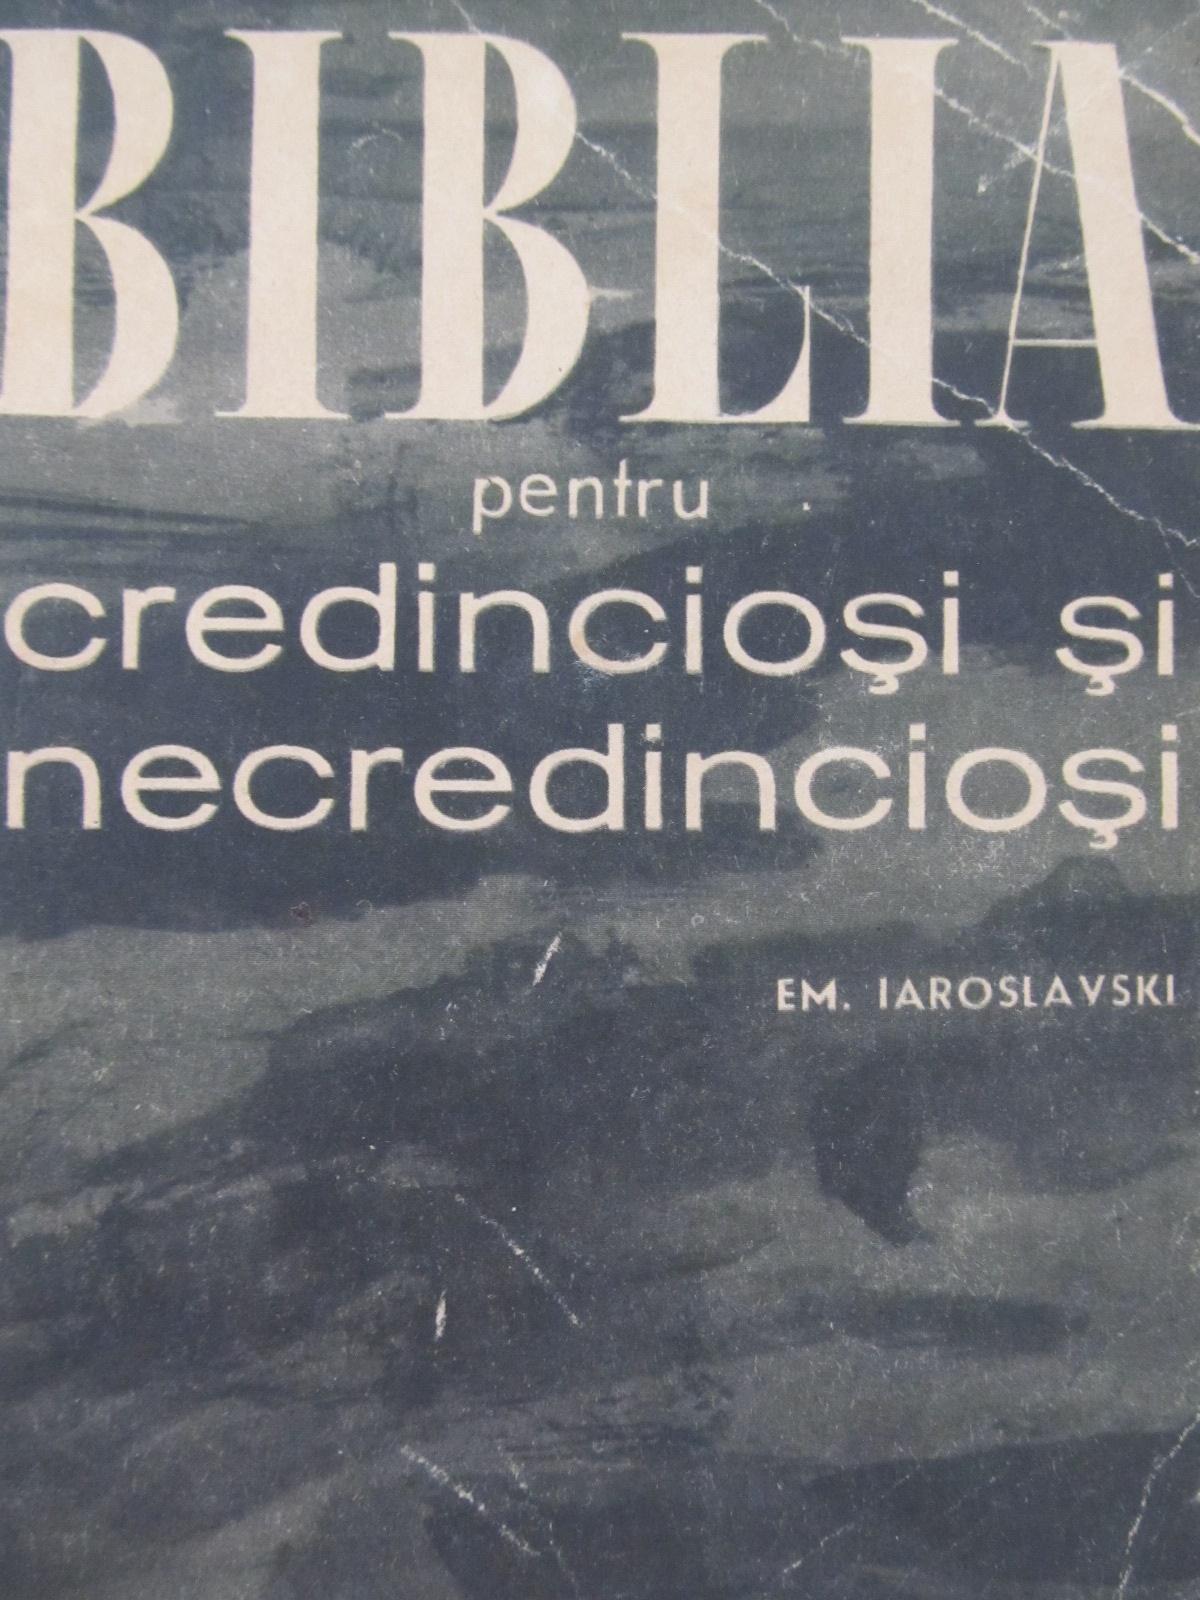 Biblia pentru credinciosi si necredinciosi [1] - Em. Iaroslavski   Detalii carte